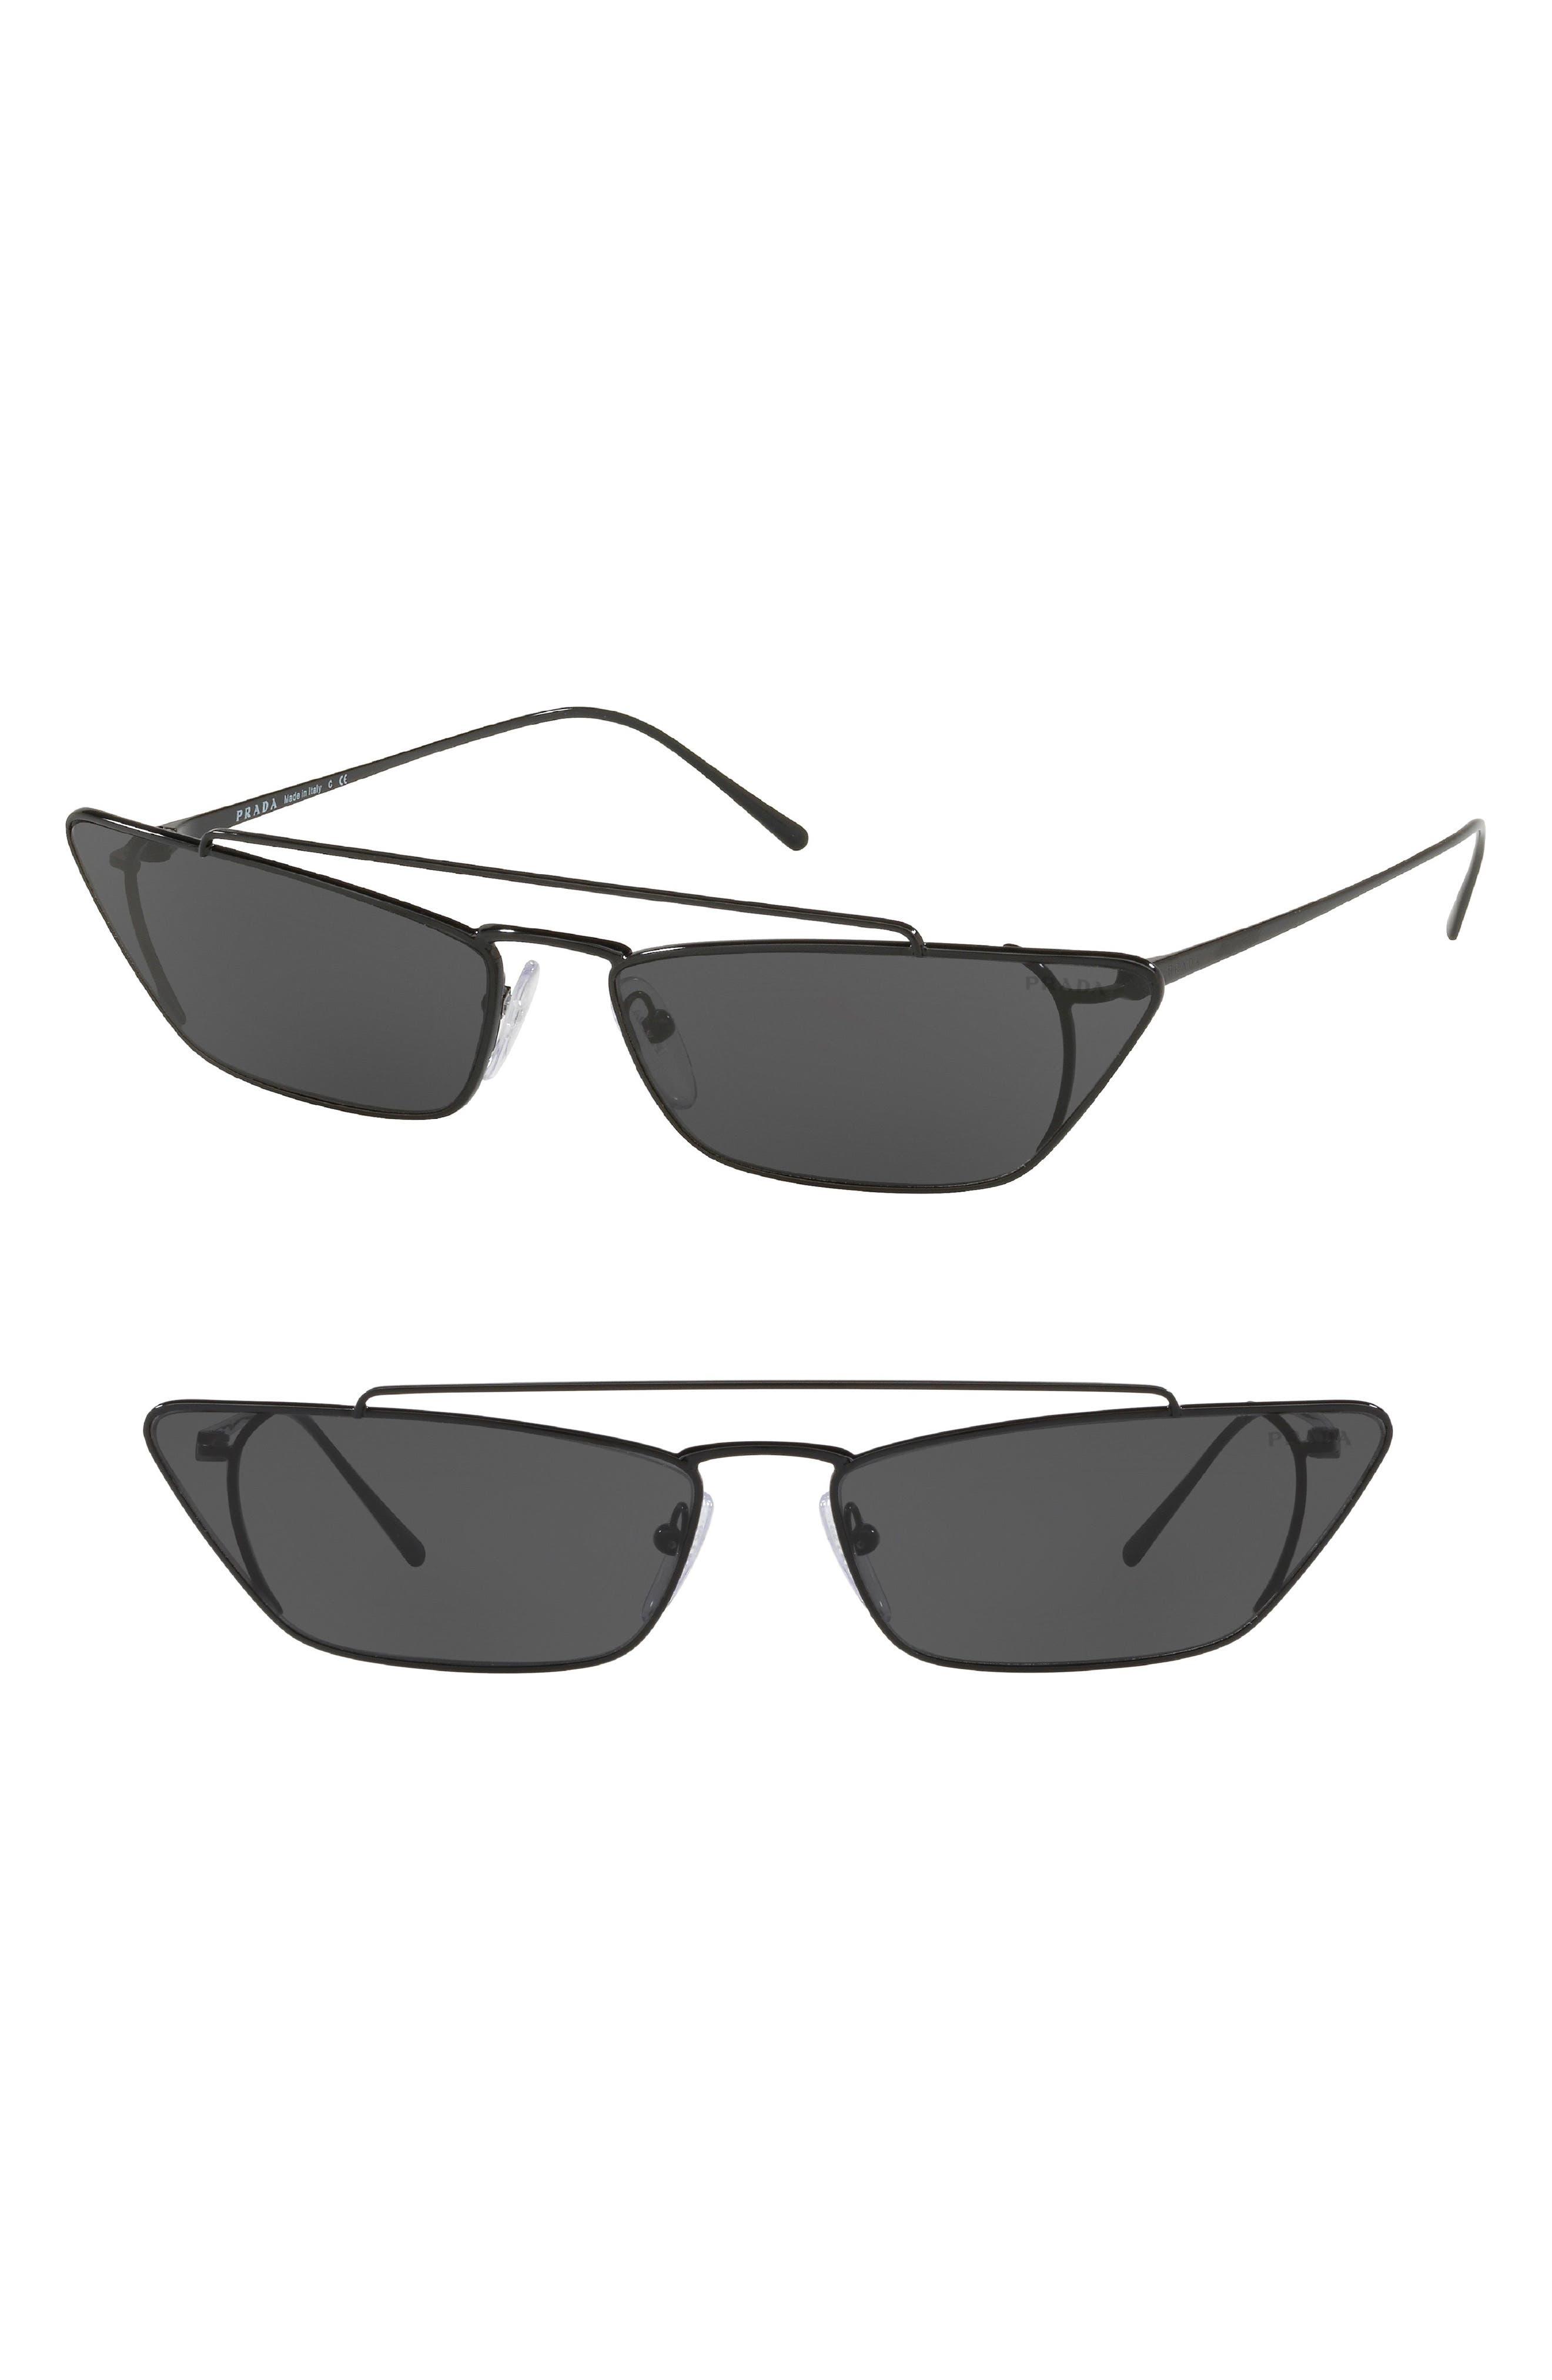 c245cc5cd Buy prada sunglasses & eyewear for women - Best women's prada sunglasses &  eyewear shop - Cools.com